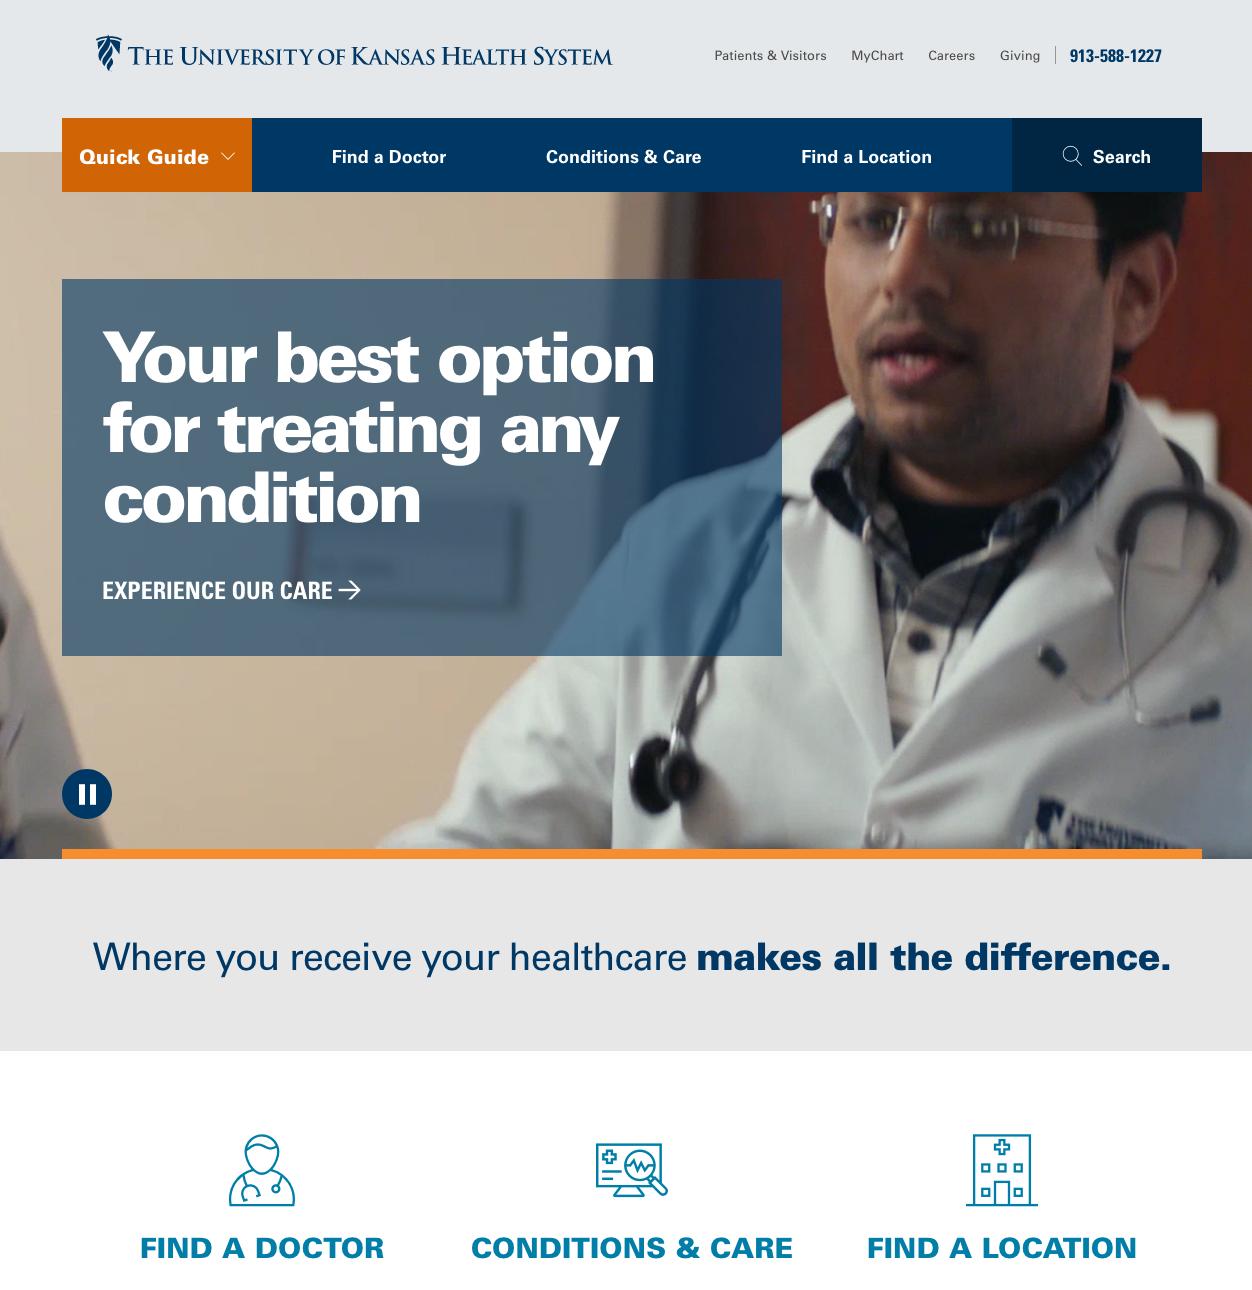 The University of Kansas Health System Website image